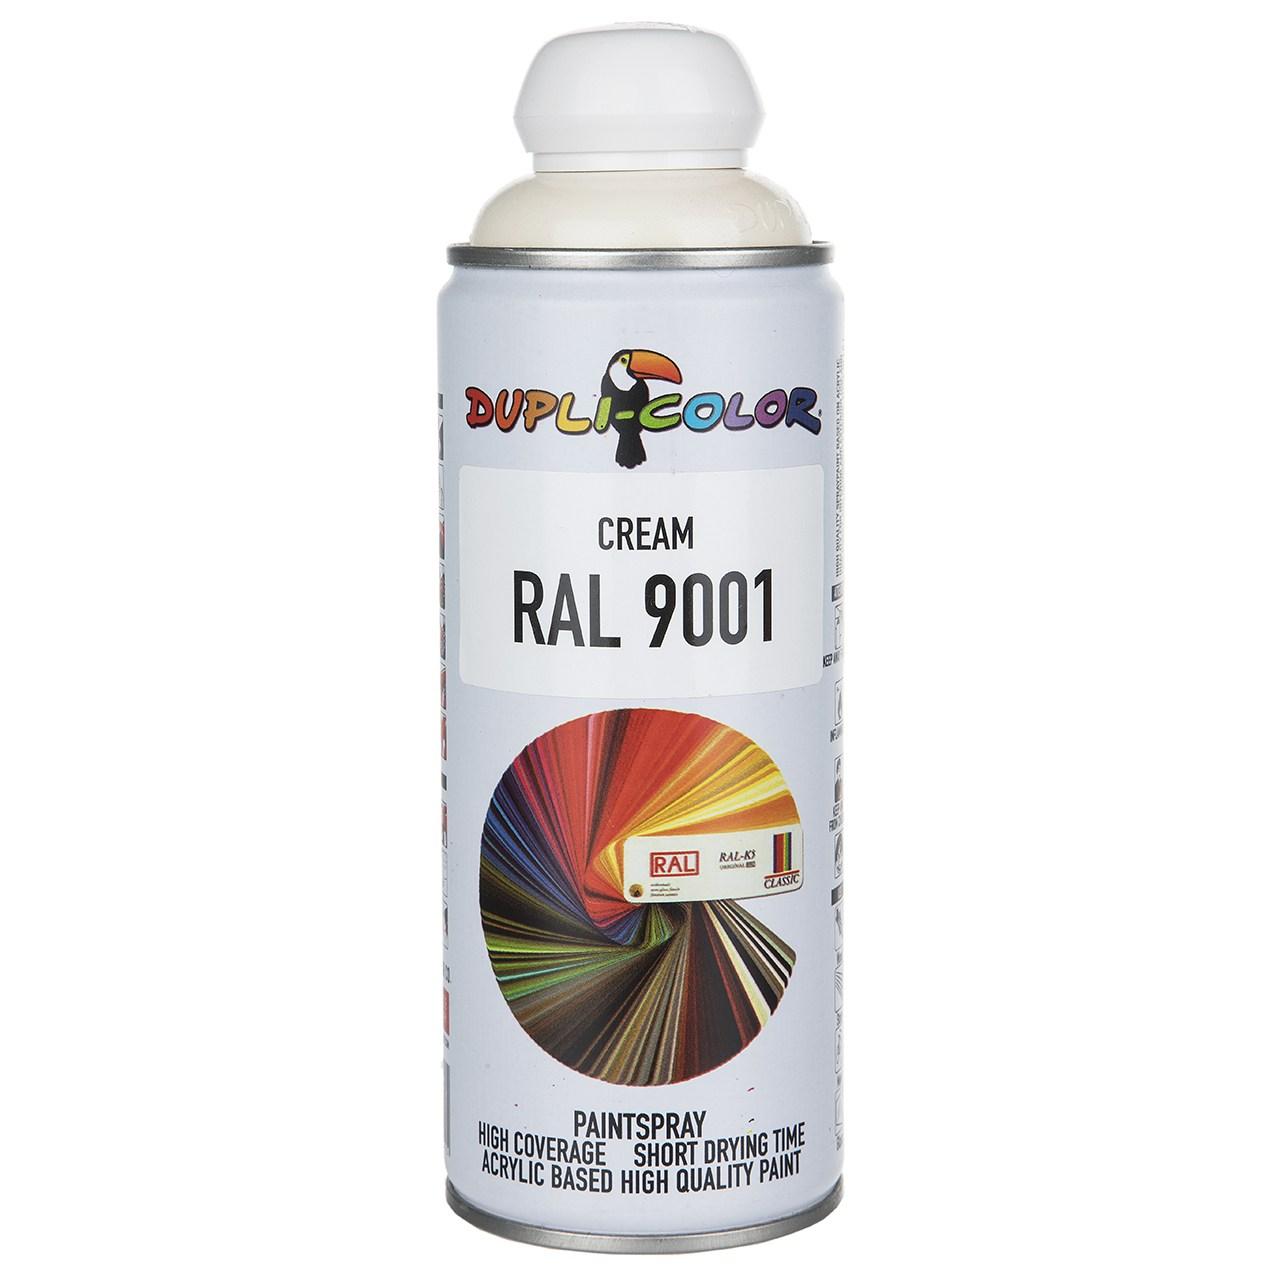 اسپری رنگ کرم دوپلی کالر مدل RAL 9001 حجم ۴۰۰ میلی لیتر